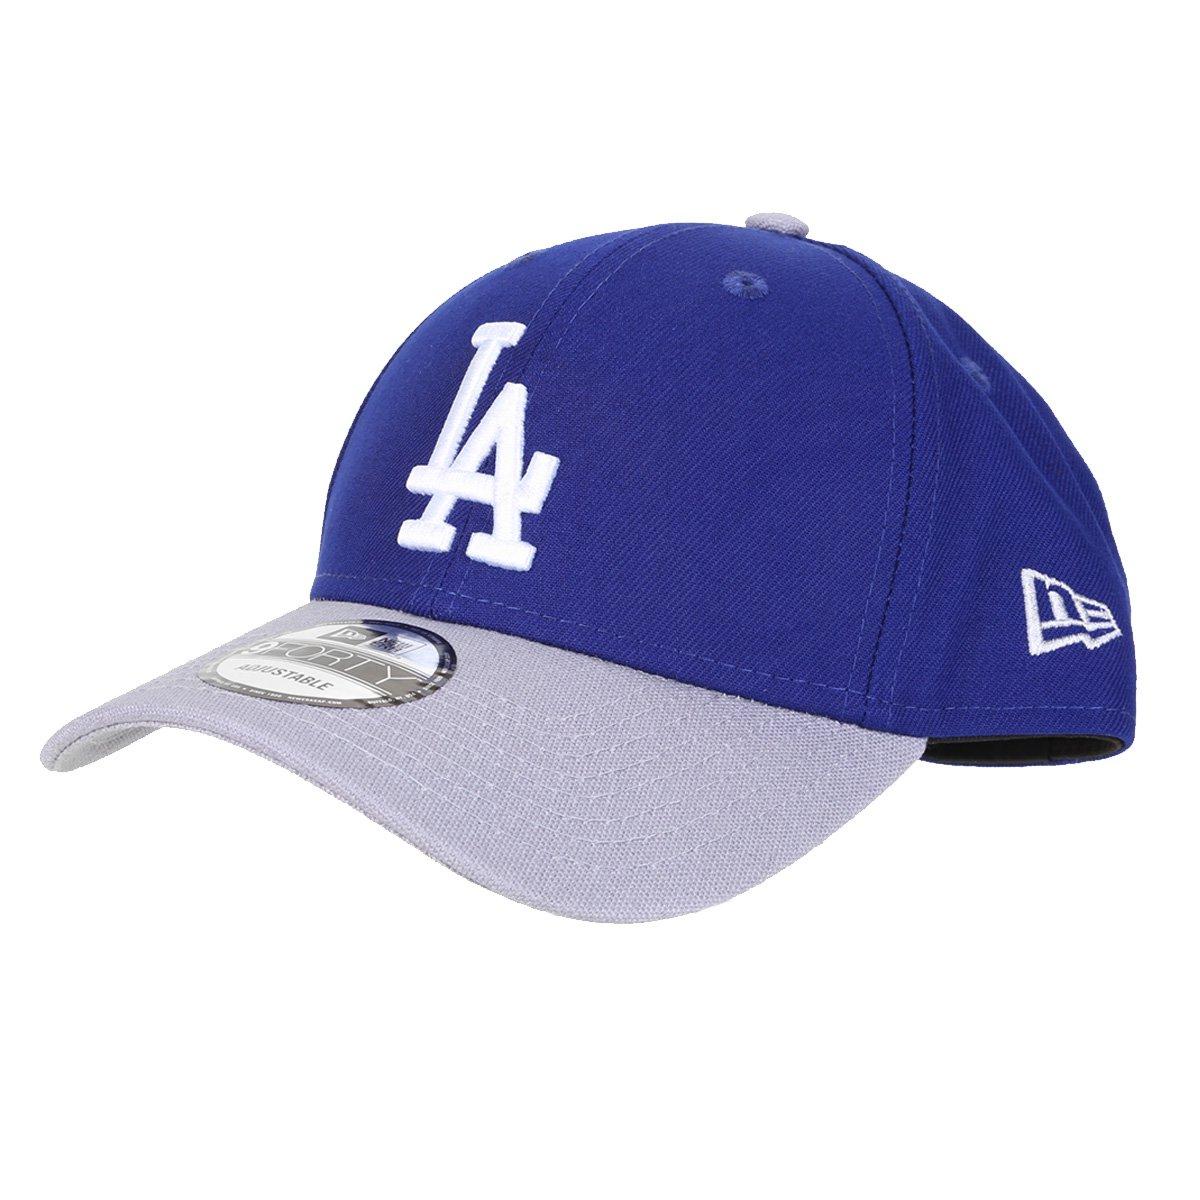 Boné New Era MLB Los Angeles Dodgers Aba Curva Snapback 9Fifty